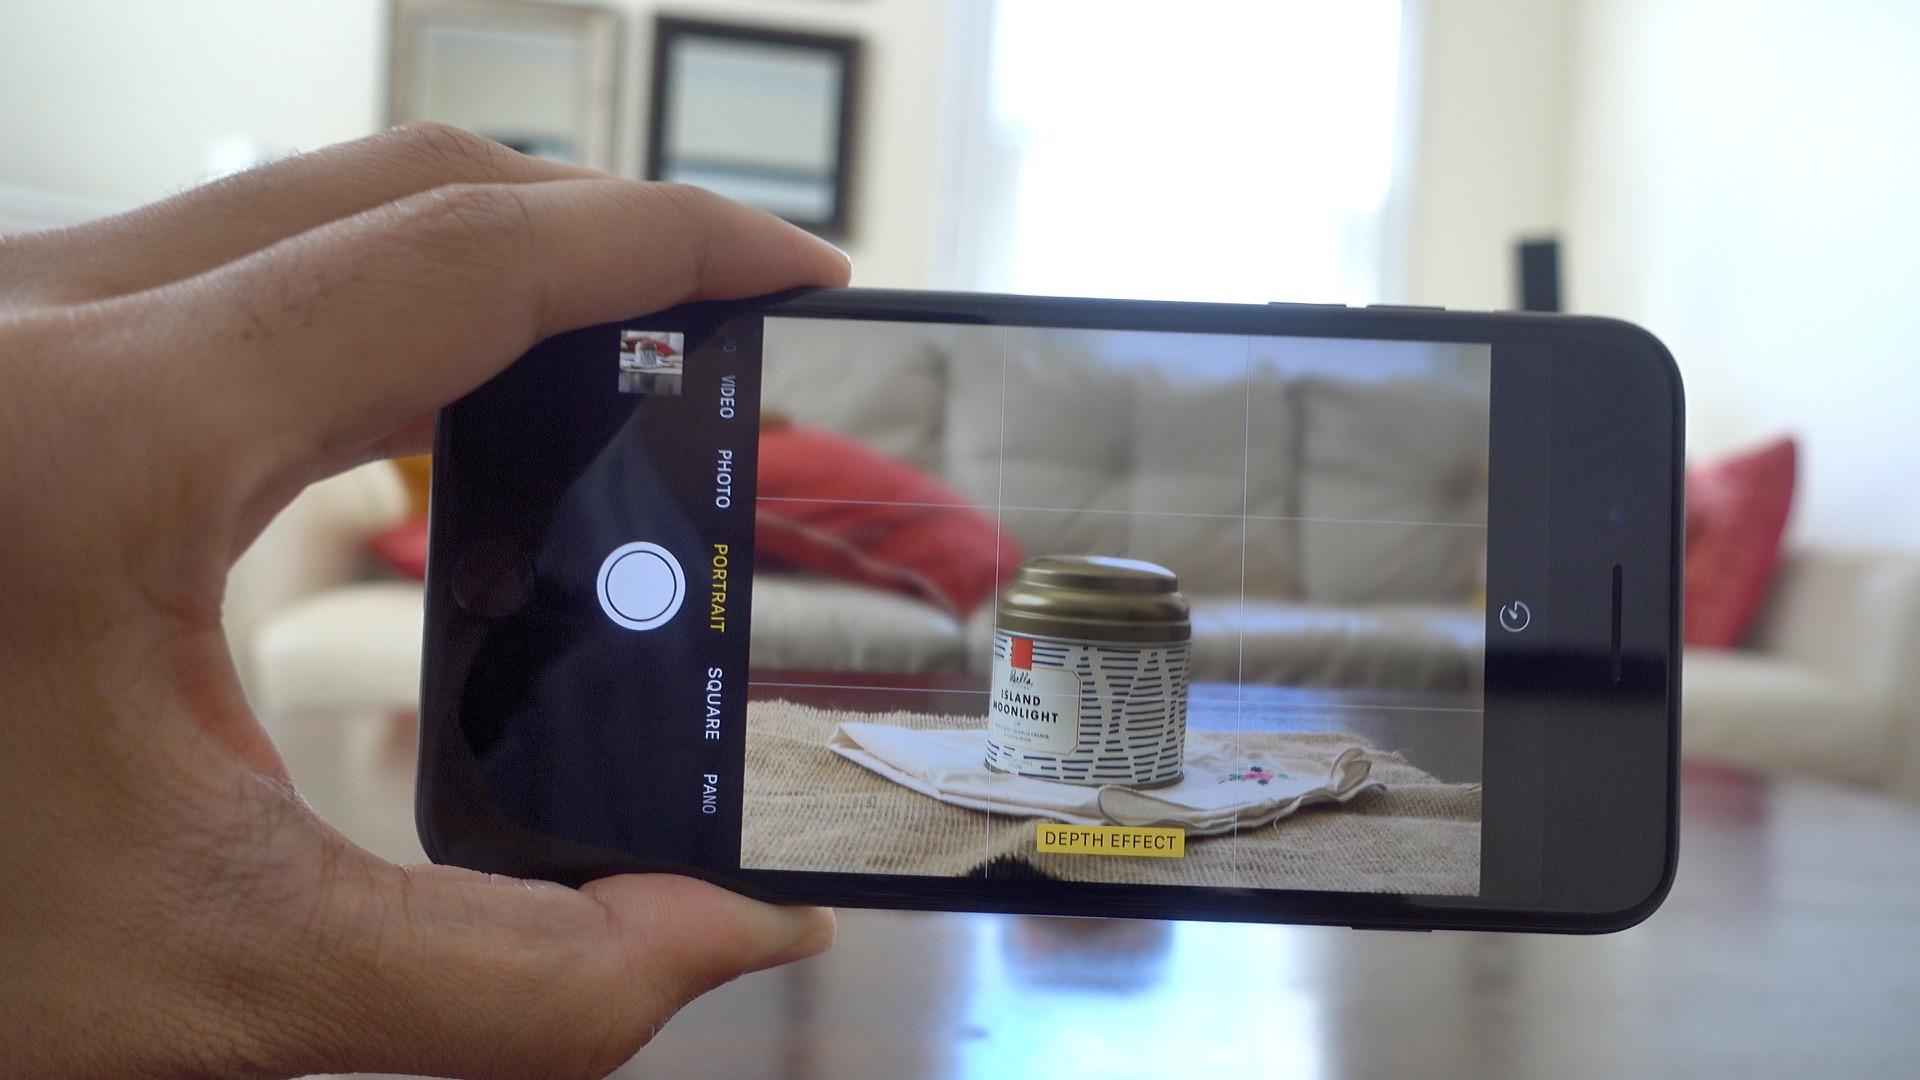 iphone-7-plus-portrait-mode